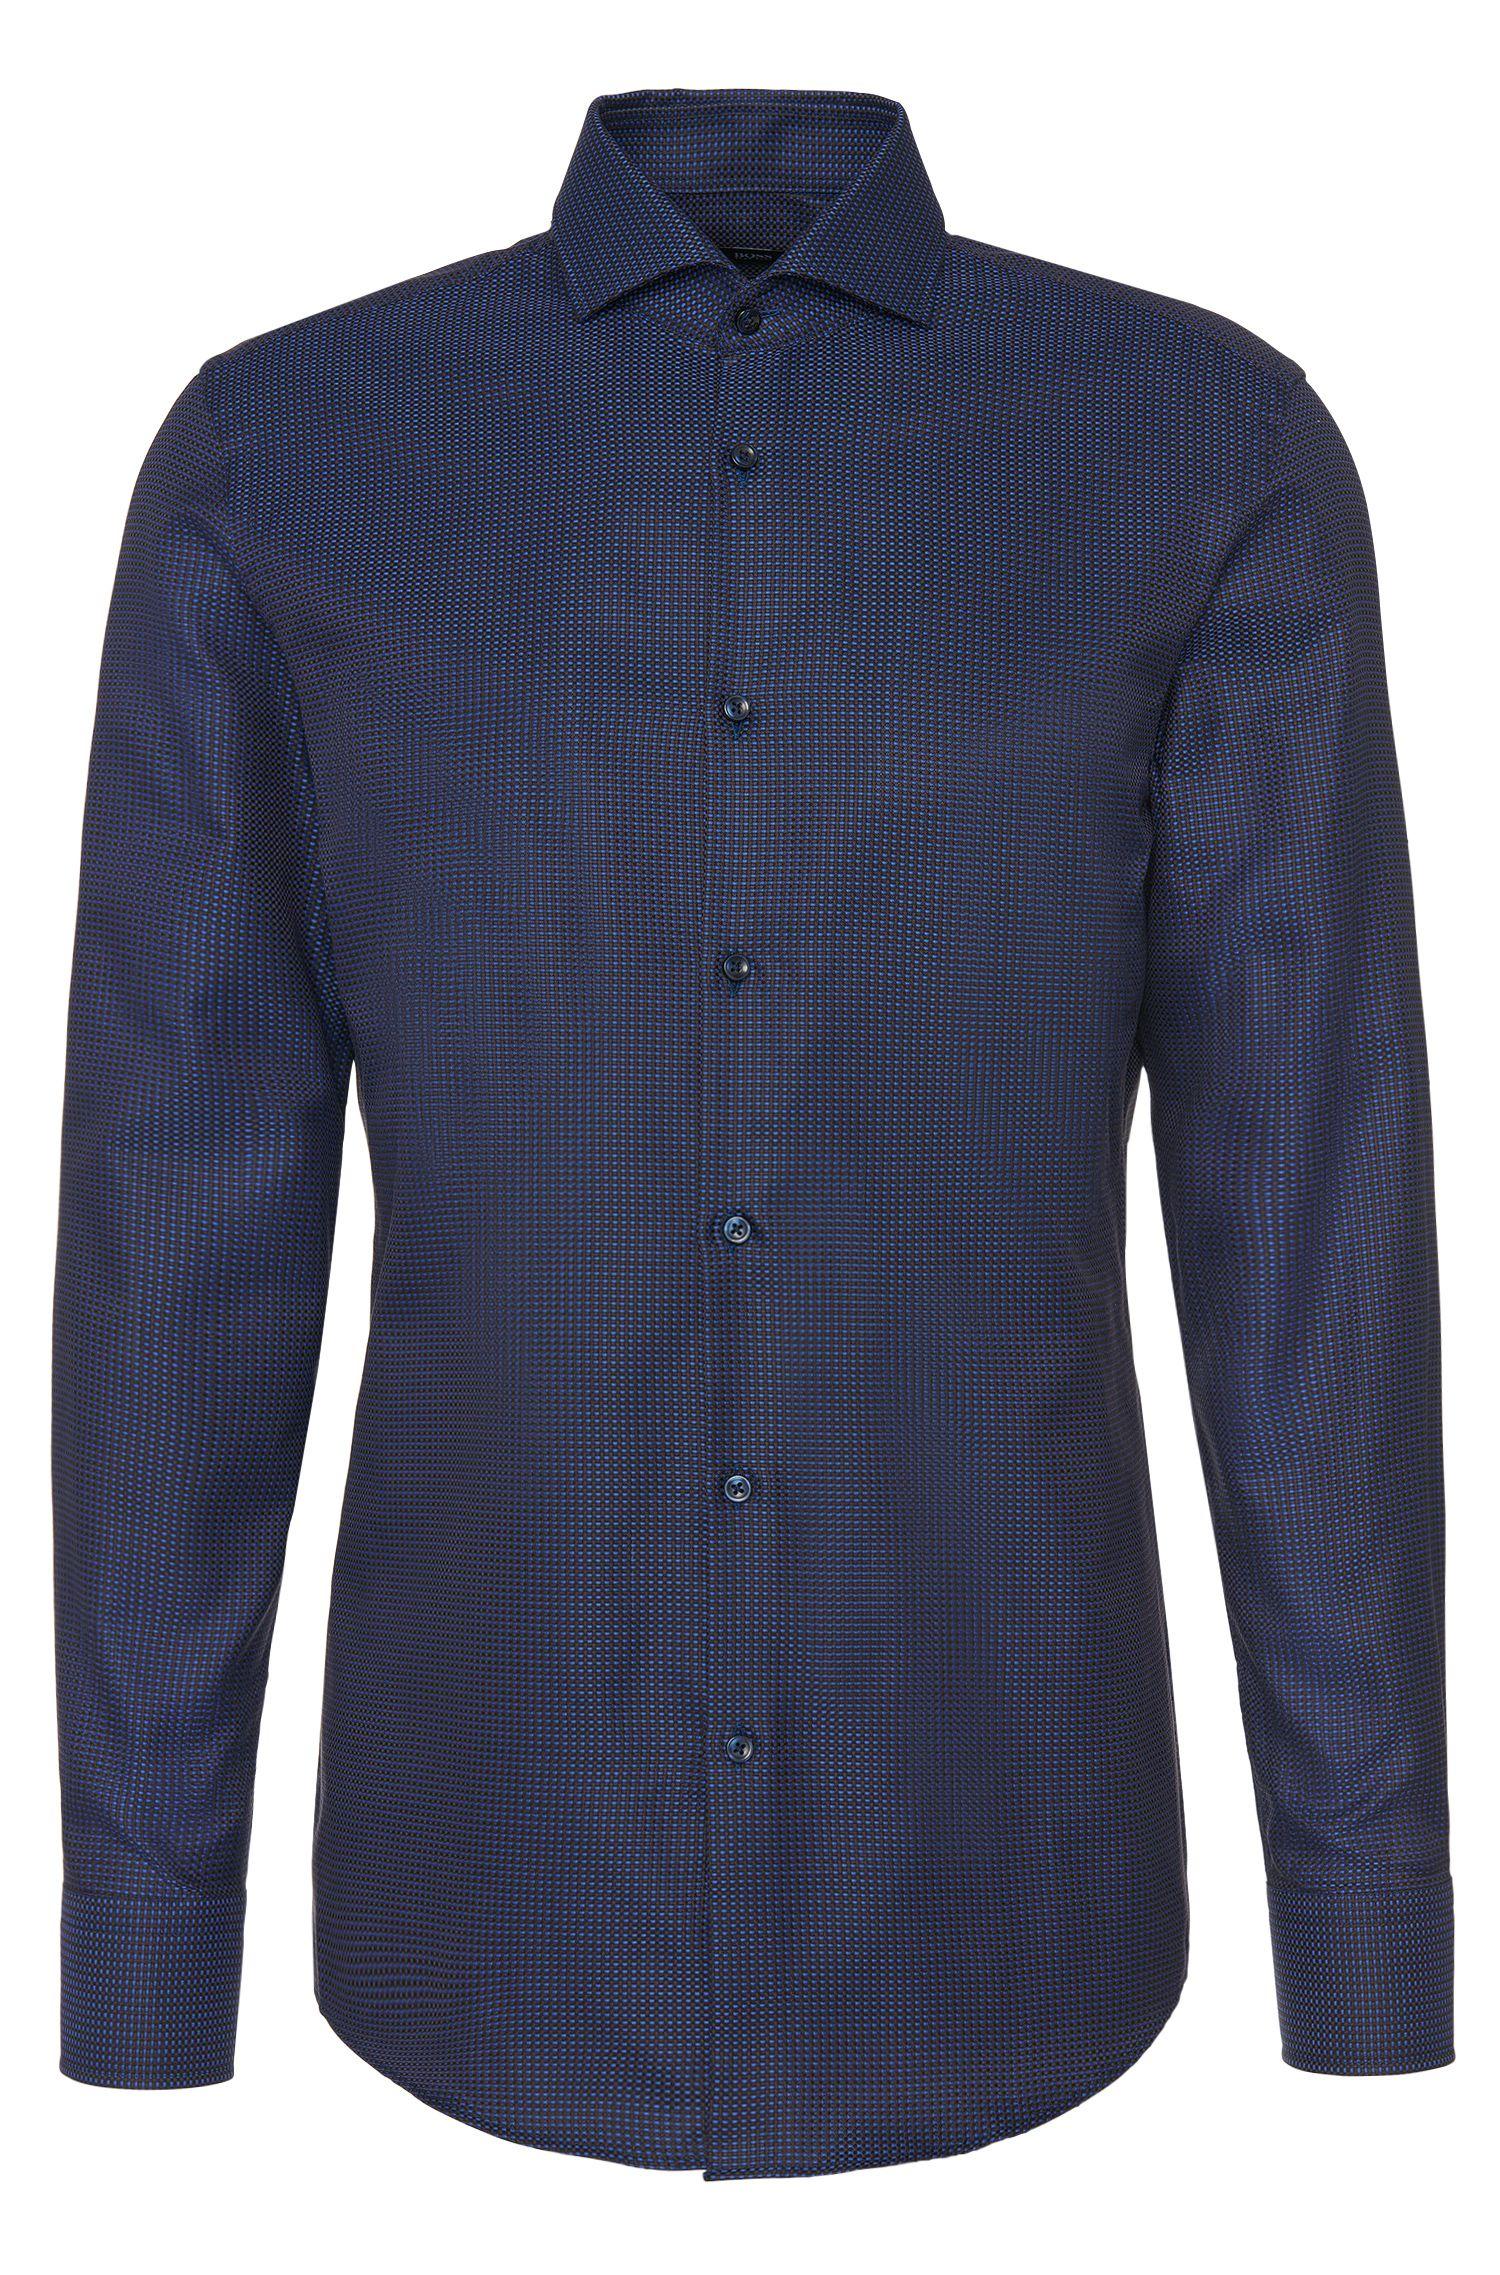 'Jason' | Slim Fit, Cotton Textured Dress Shirt